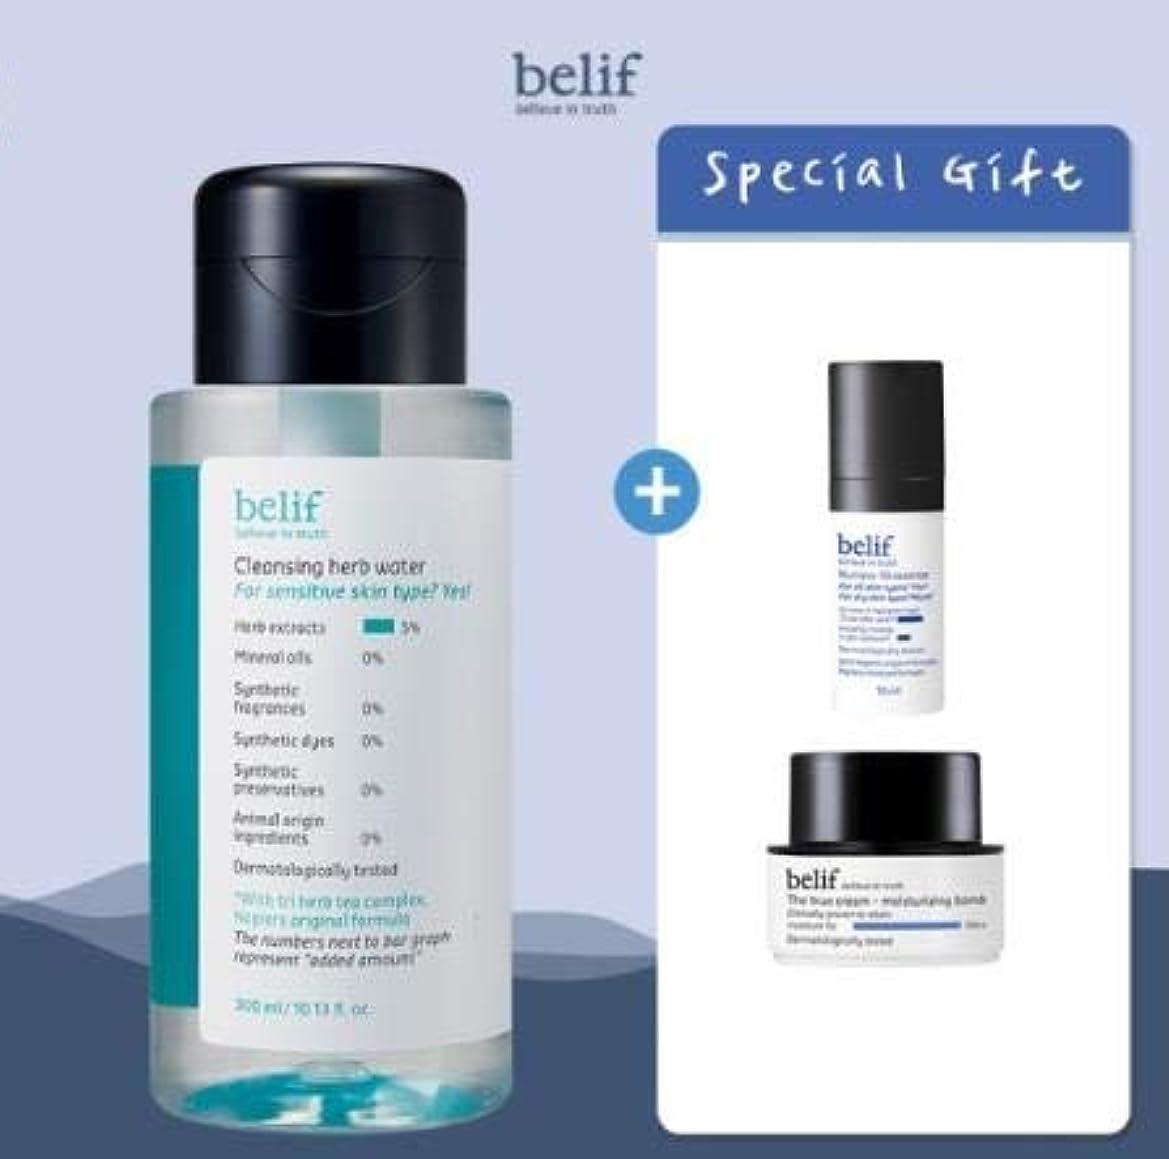 belif Cleansing Herb Water 300ml (+Special Gifts) ビリープクレンジングハーブウォーター 300ml (+スペシャルギフト) [並行輸入品]